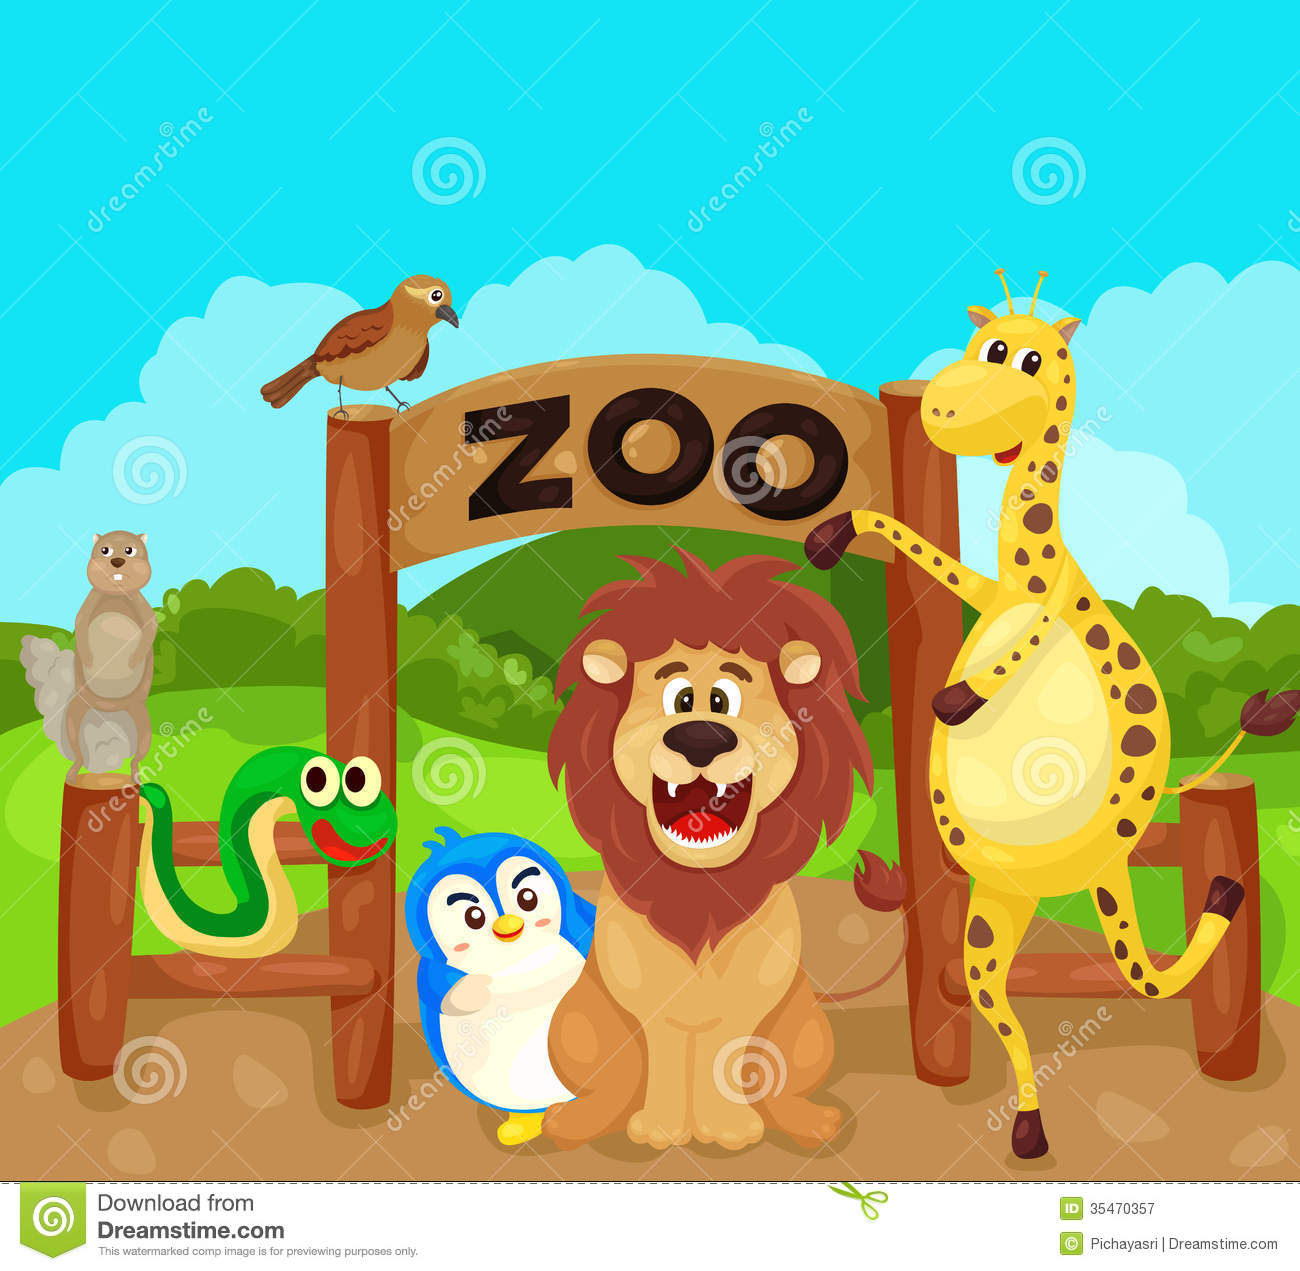 Zoo Entrance Free Clipart-Zoo Entrance Free Clipart-14